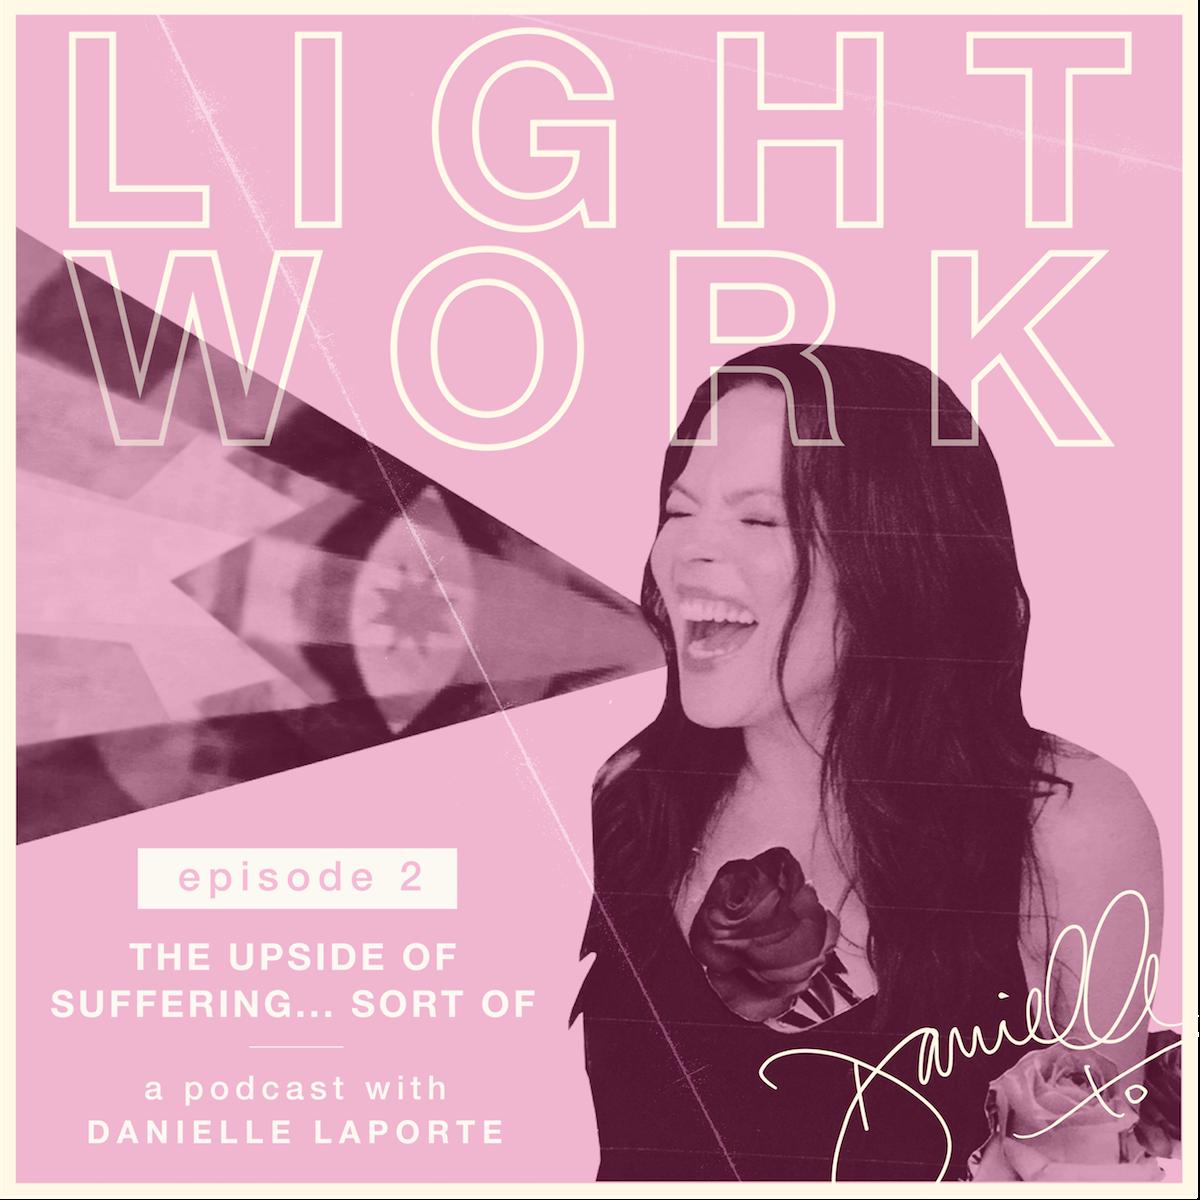 The-Upside-of-suffering-DanielleLaporte.LightWork.Episode2_EmailHeader.2.1200x1200